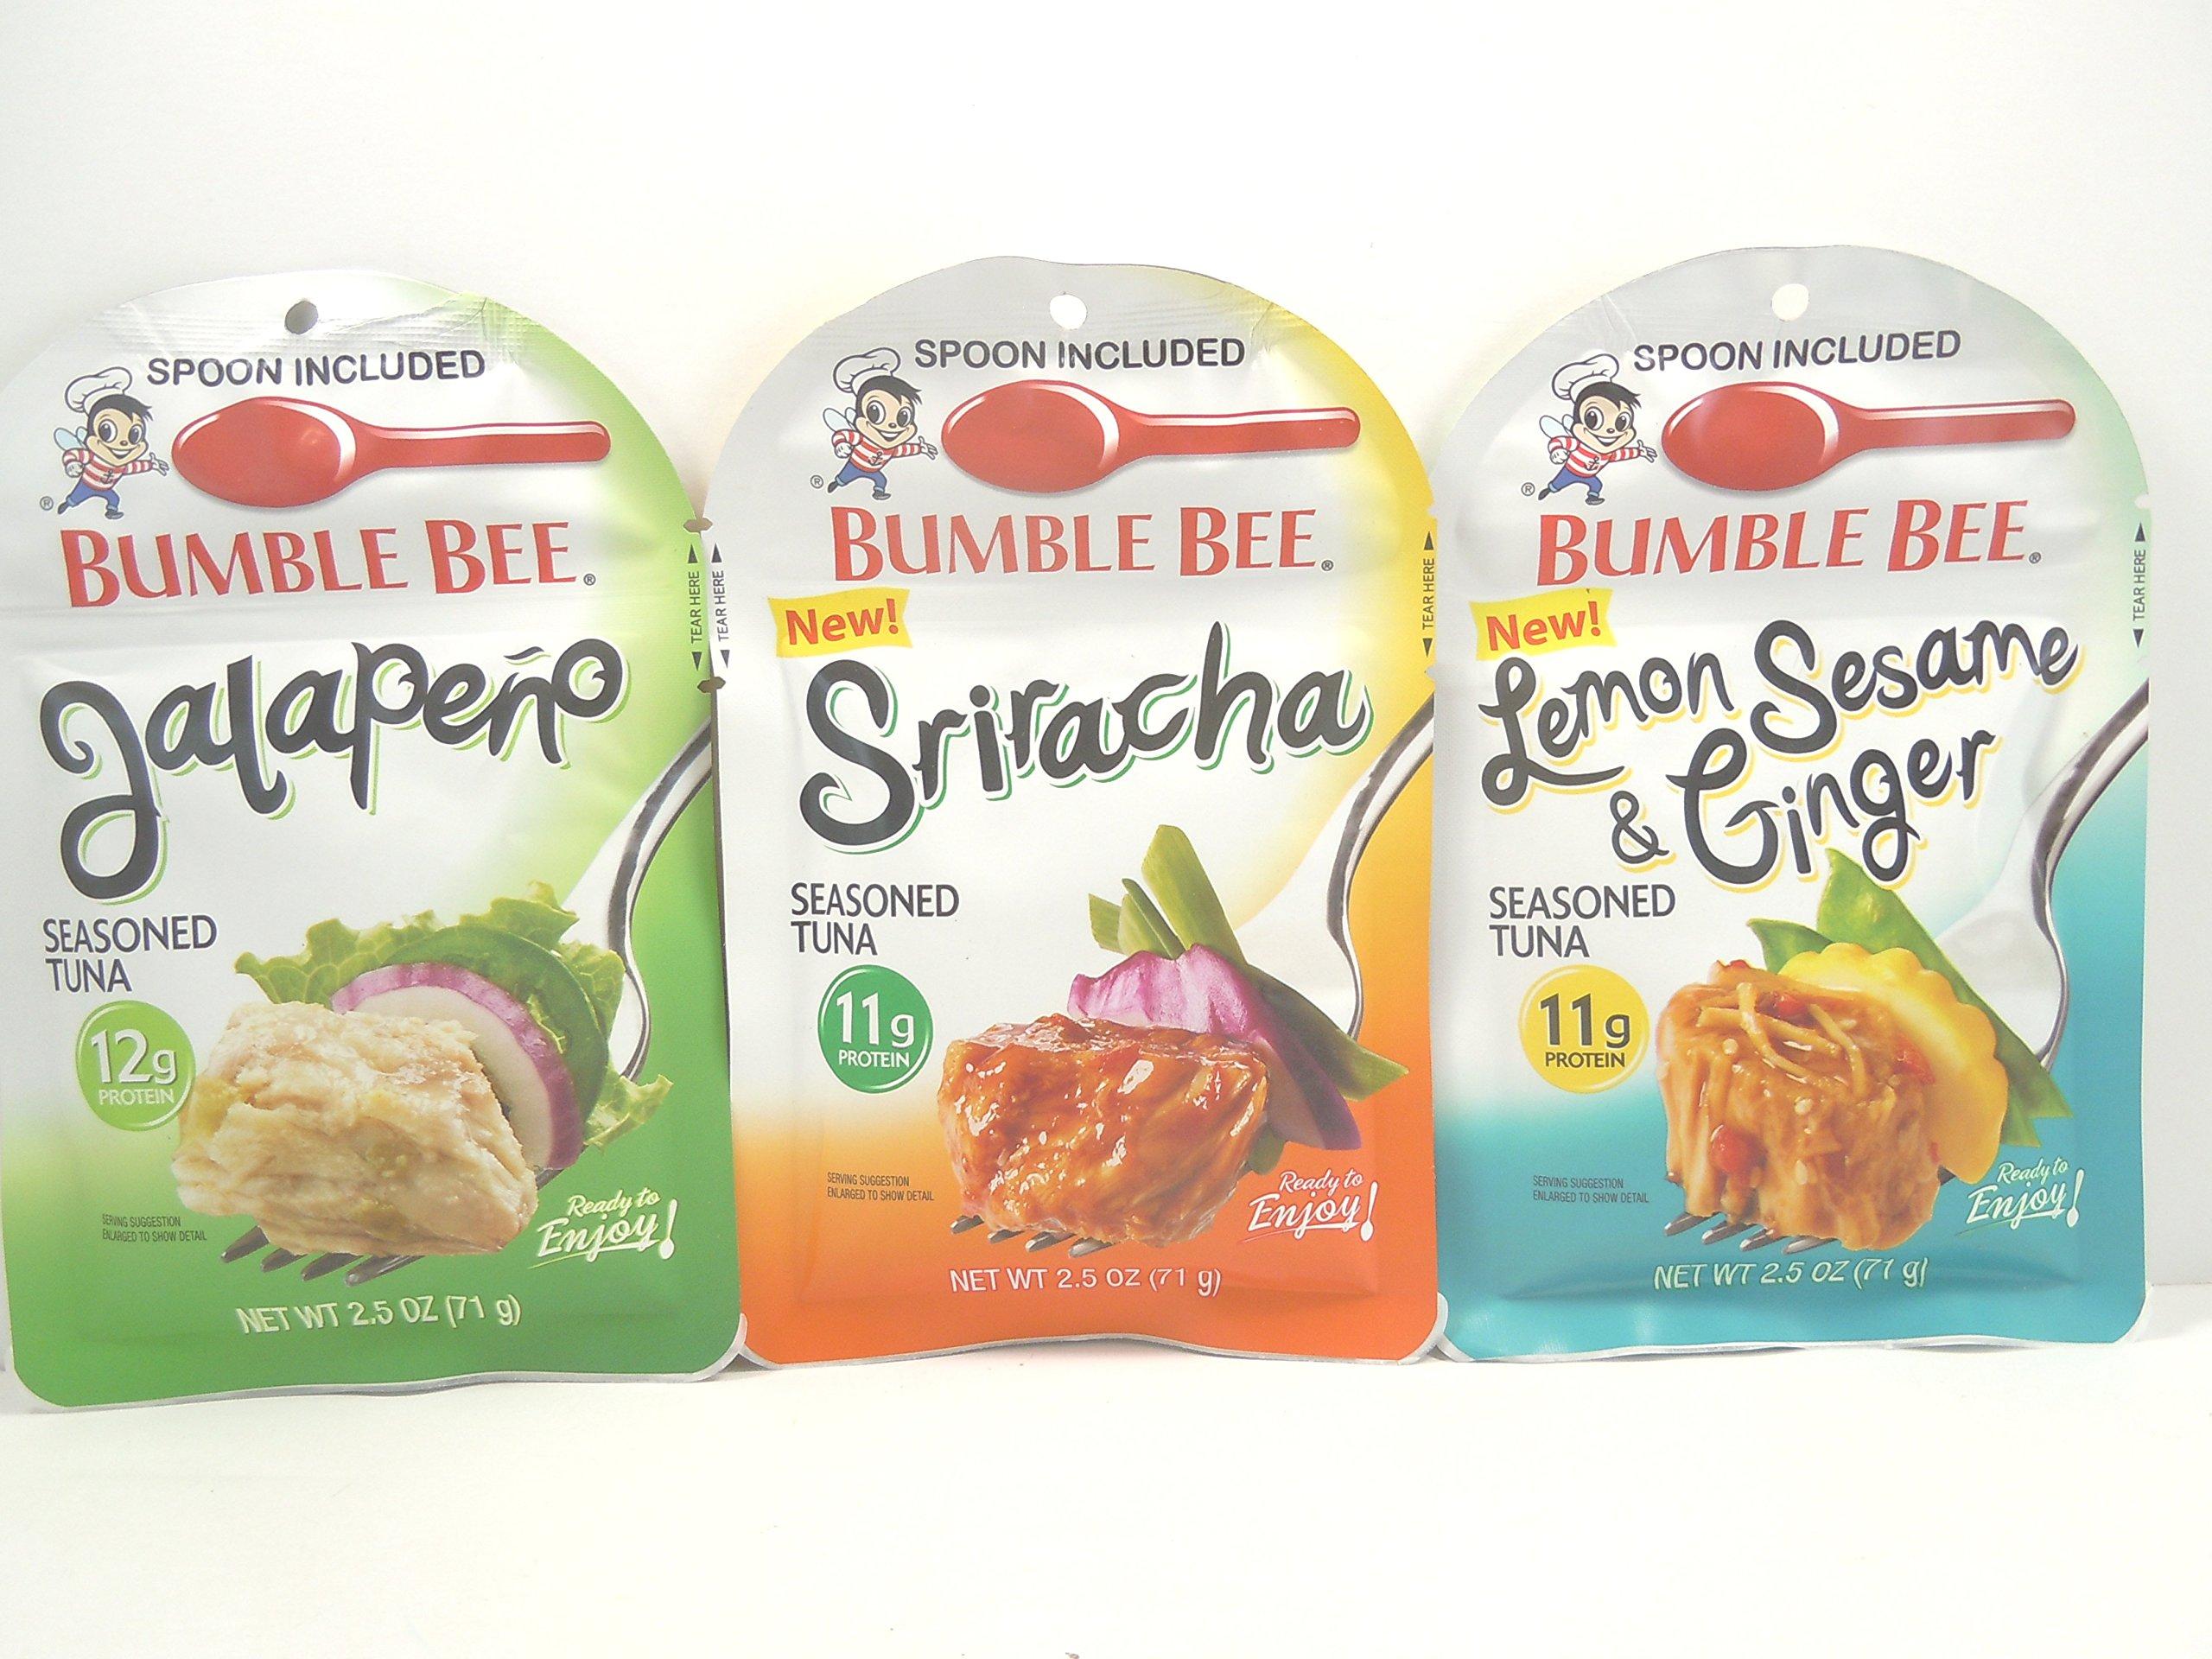 Bumble Bee NEW Seasoned Tuna : Jalapeno,Sriracha, and Lemon Sesame & Ginger, 2.5 oz.ea. Bundle of 3 Pouches